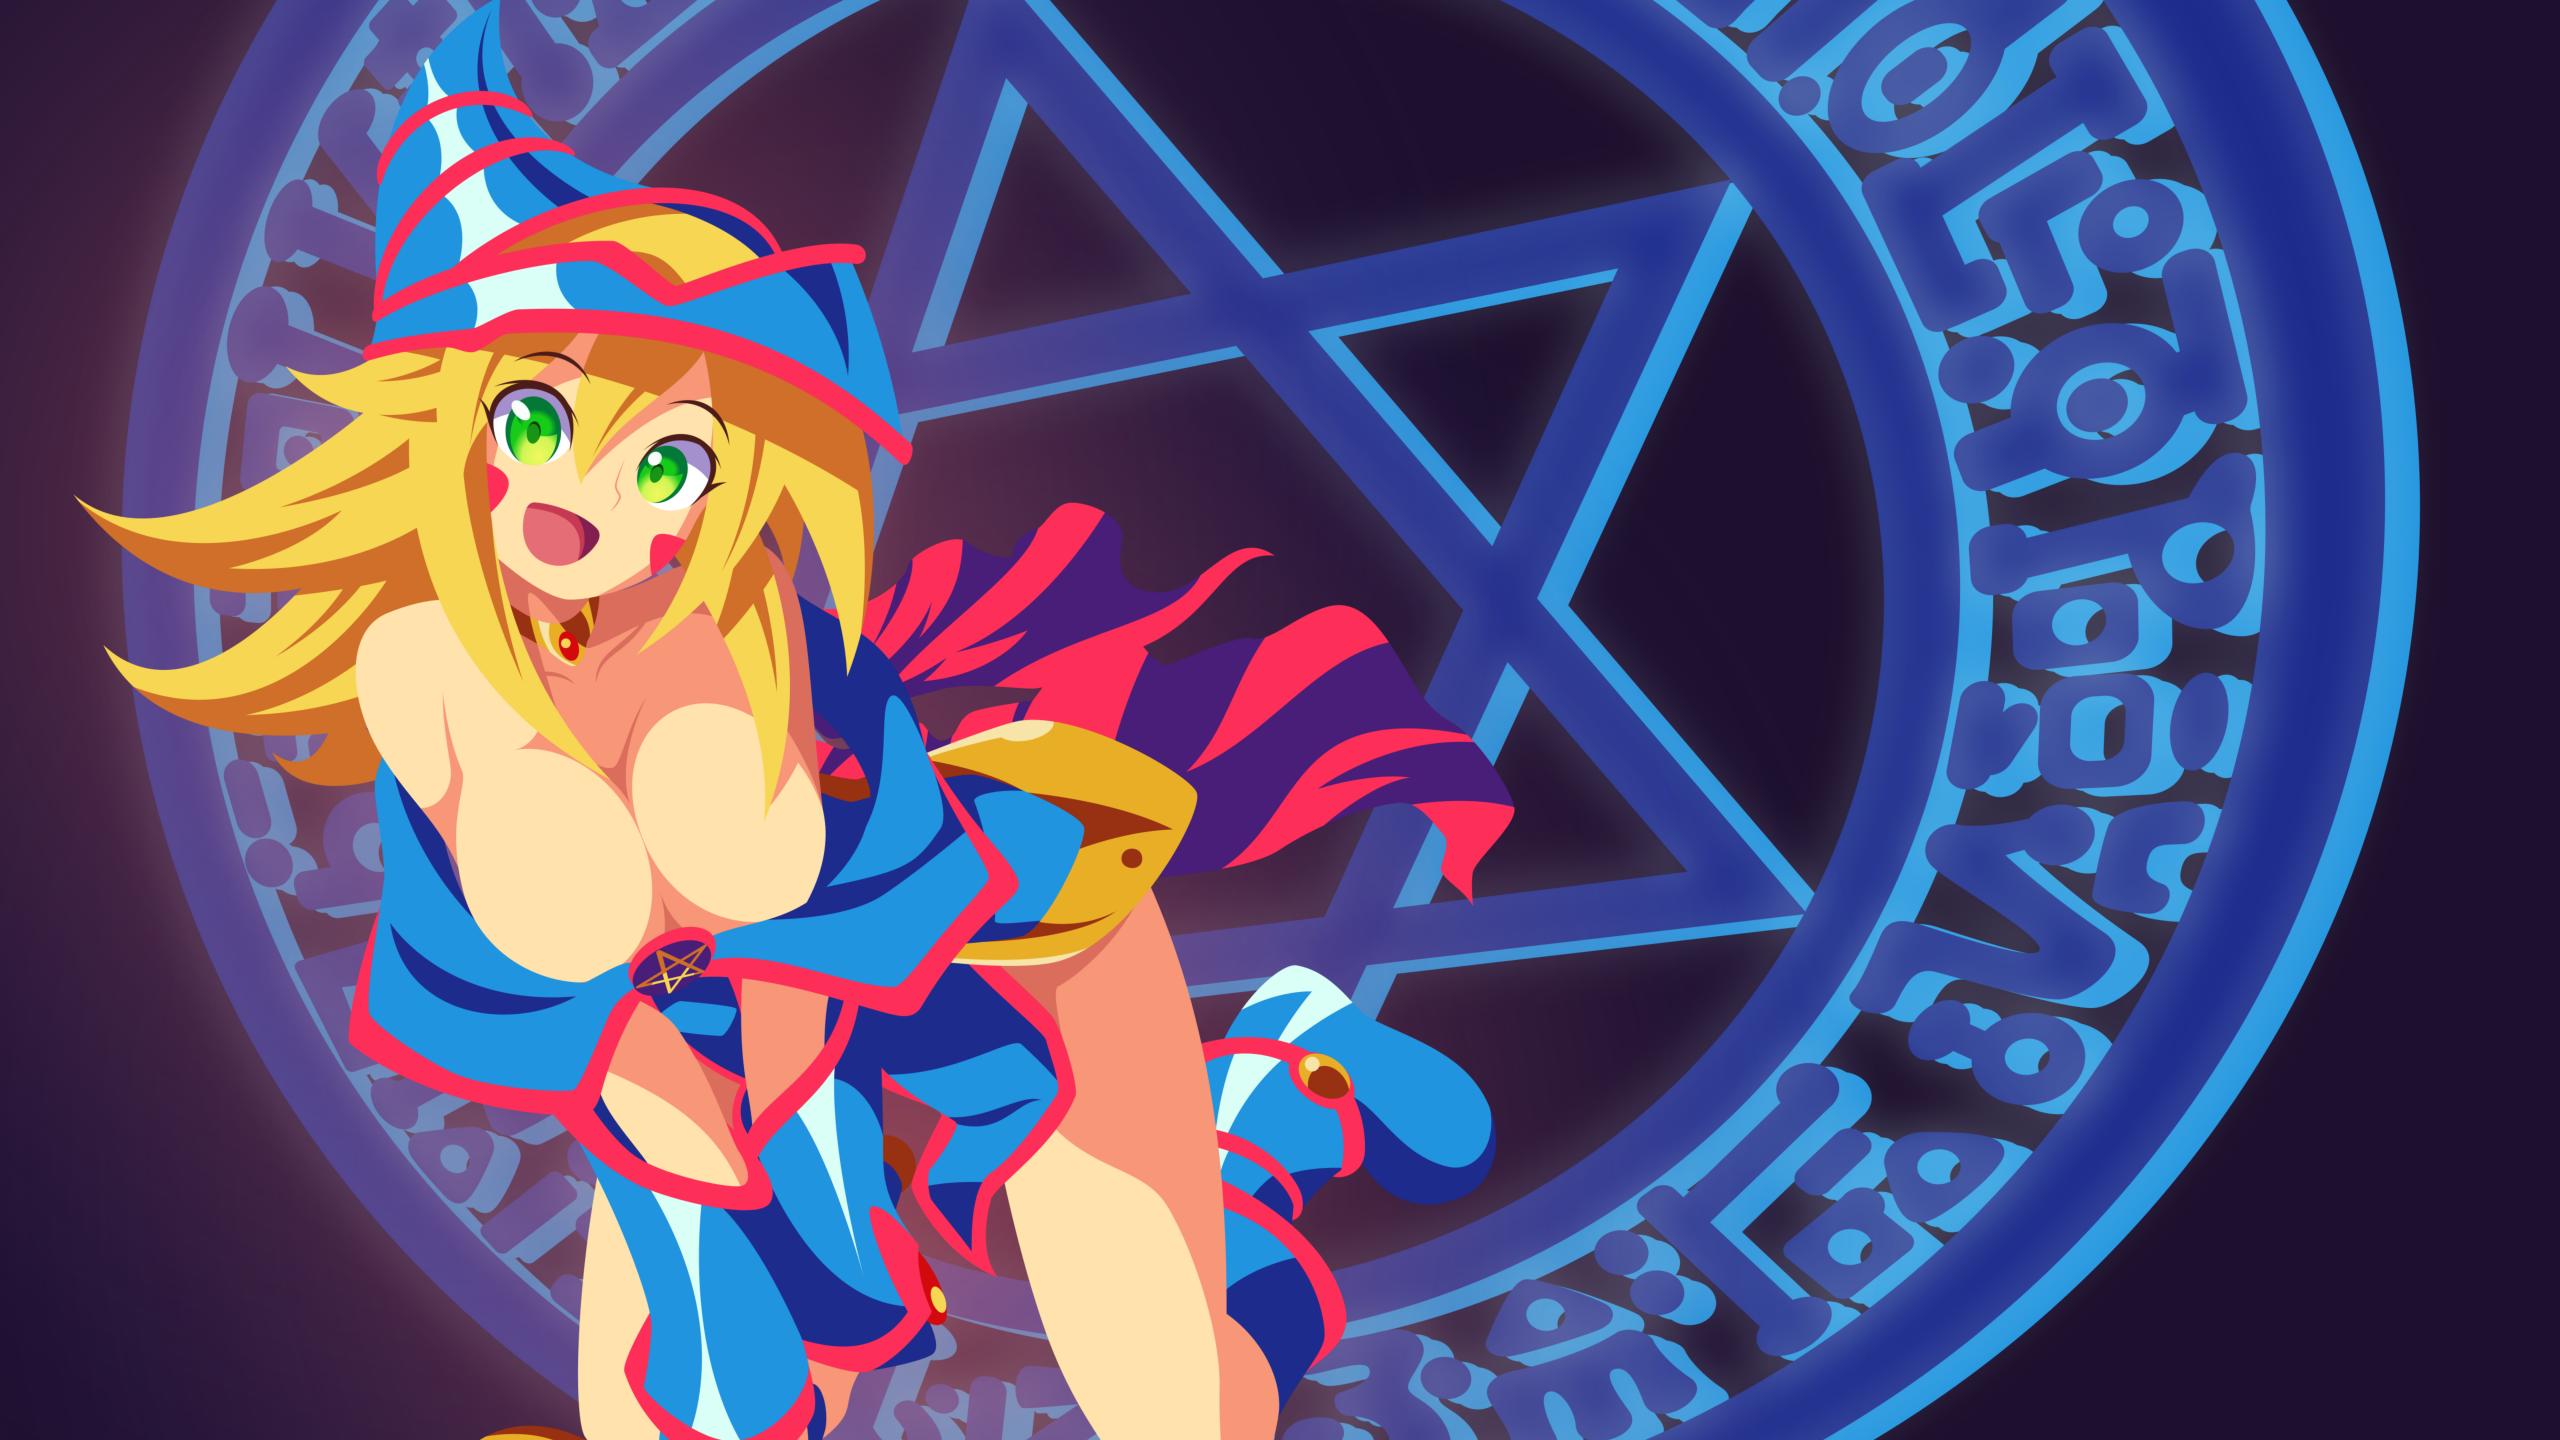 Yugioh Dark Magician Girl Wallpaper By Carionto On Deviantart